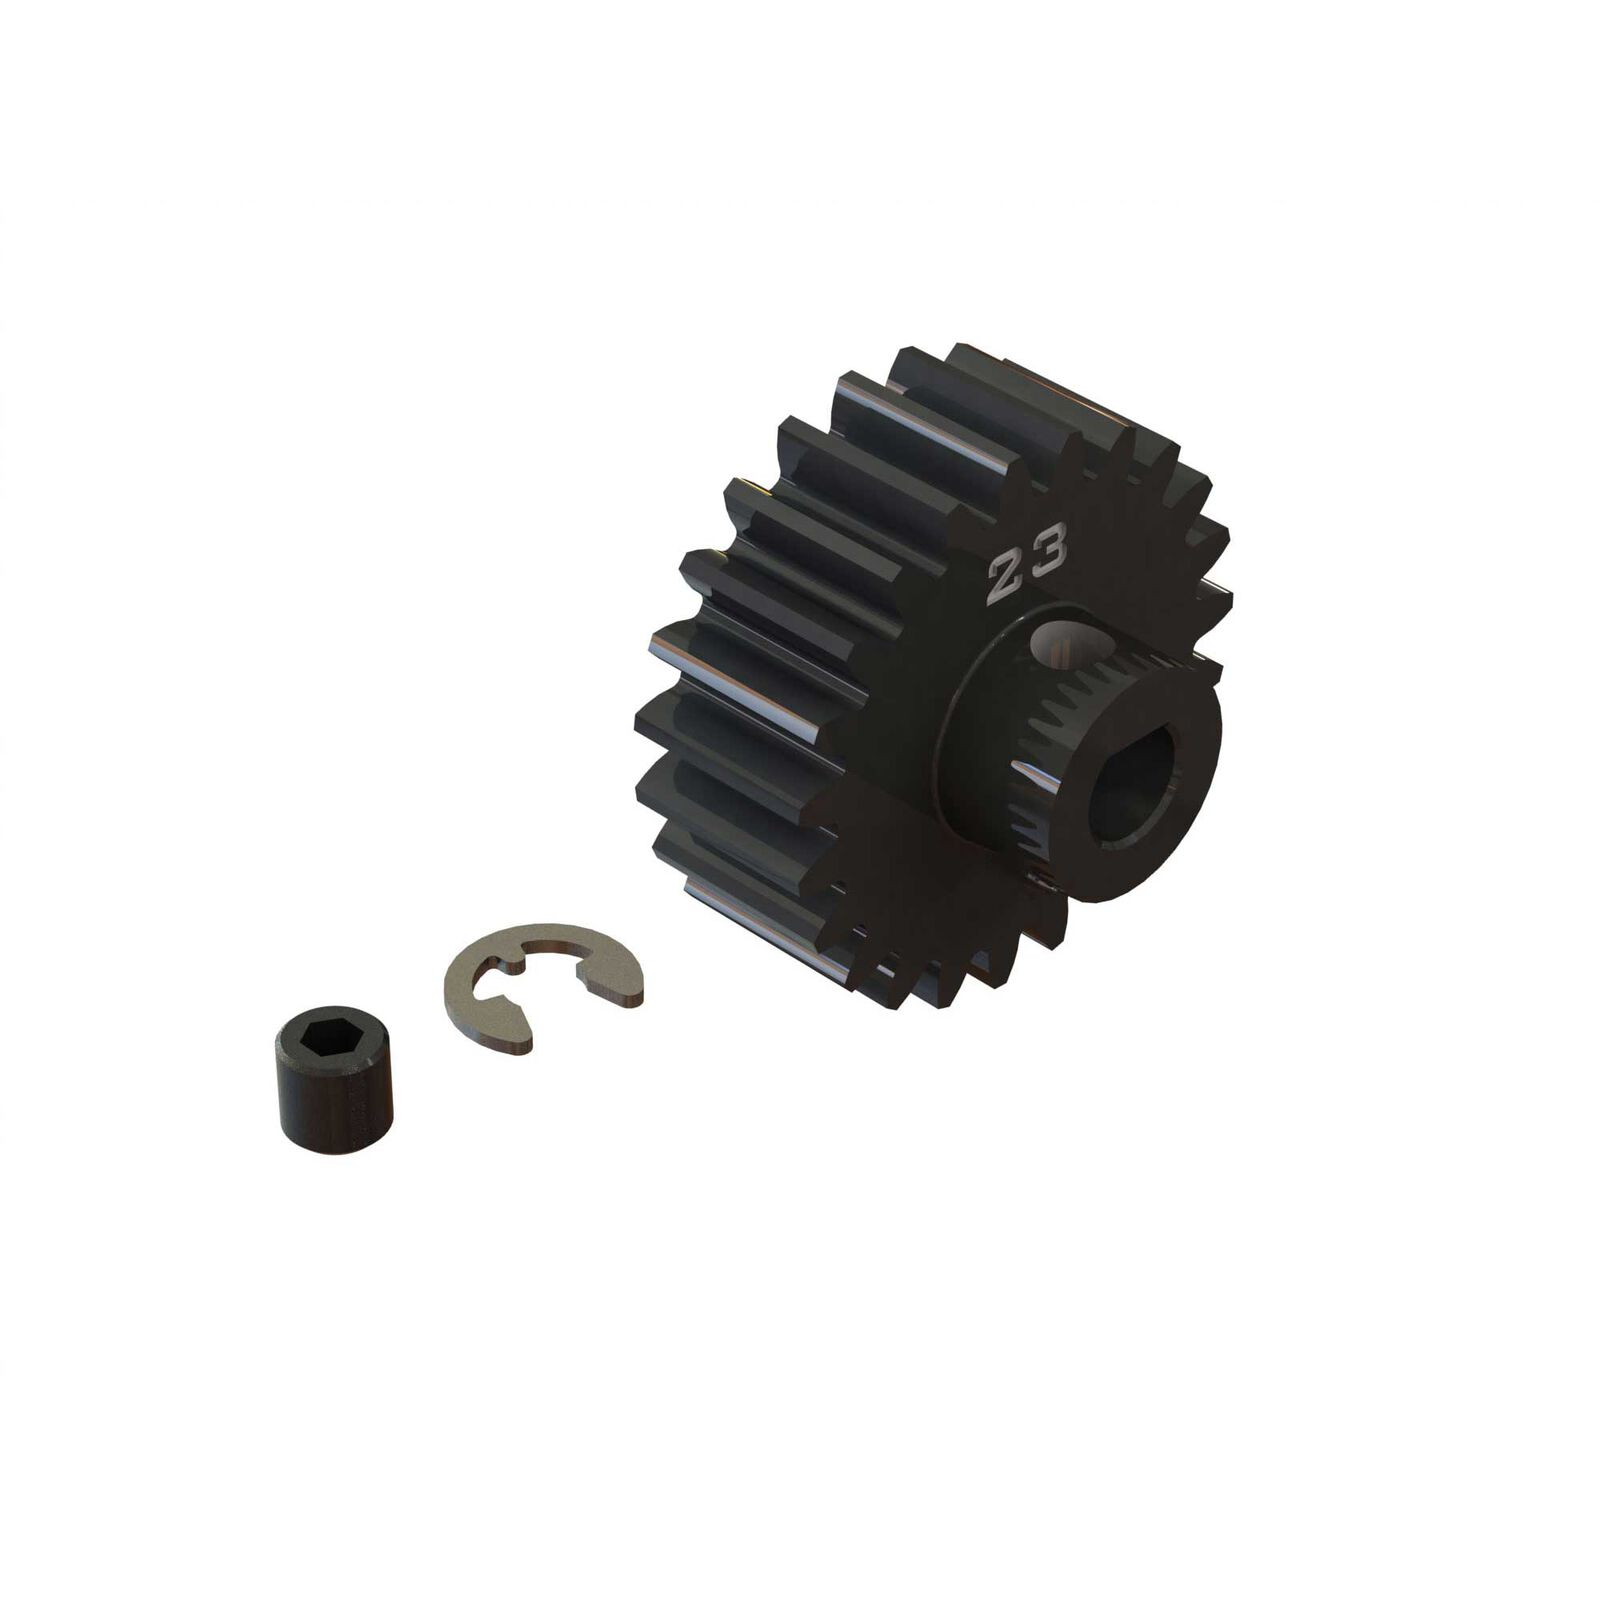 Pinion Gear, 23T HD Mod1 Safe-D5